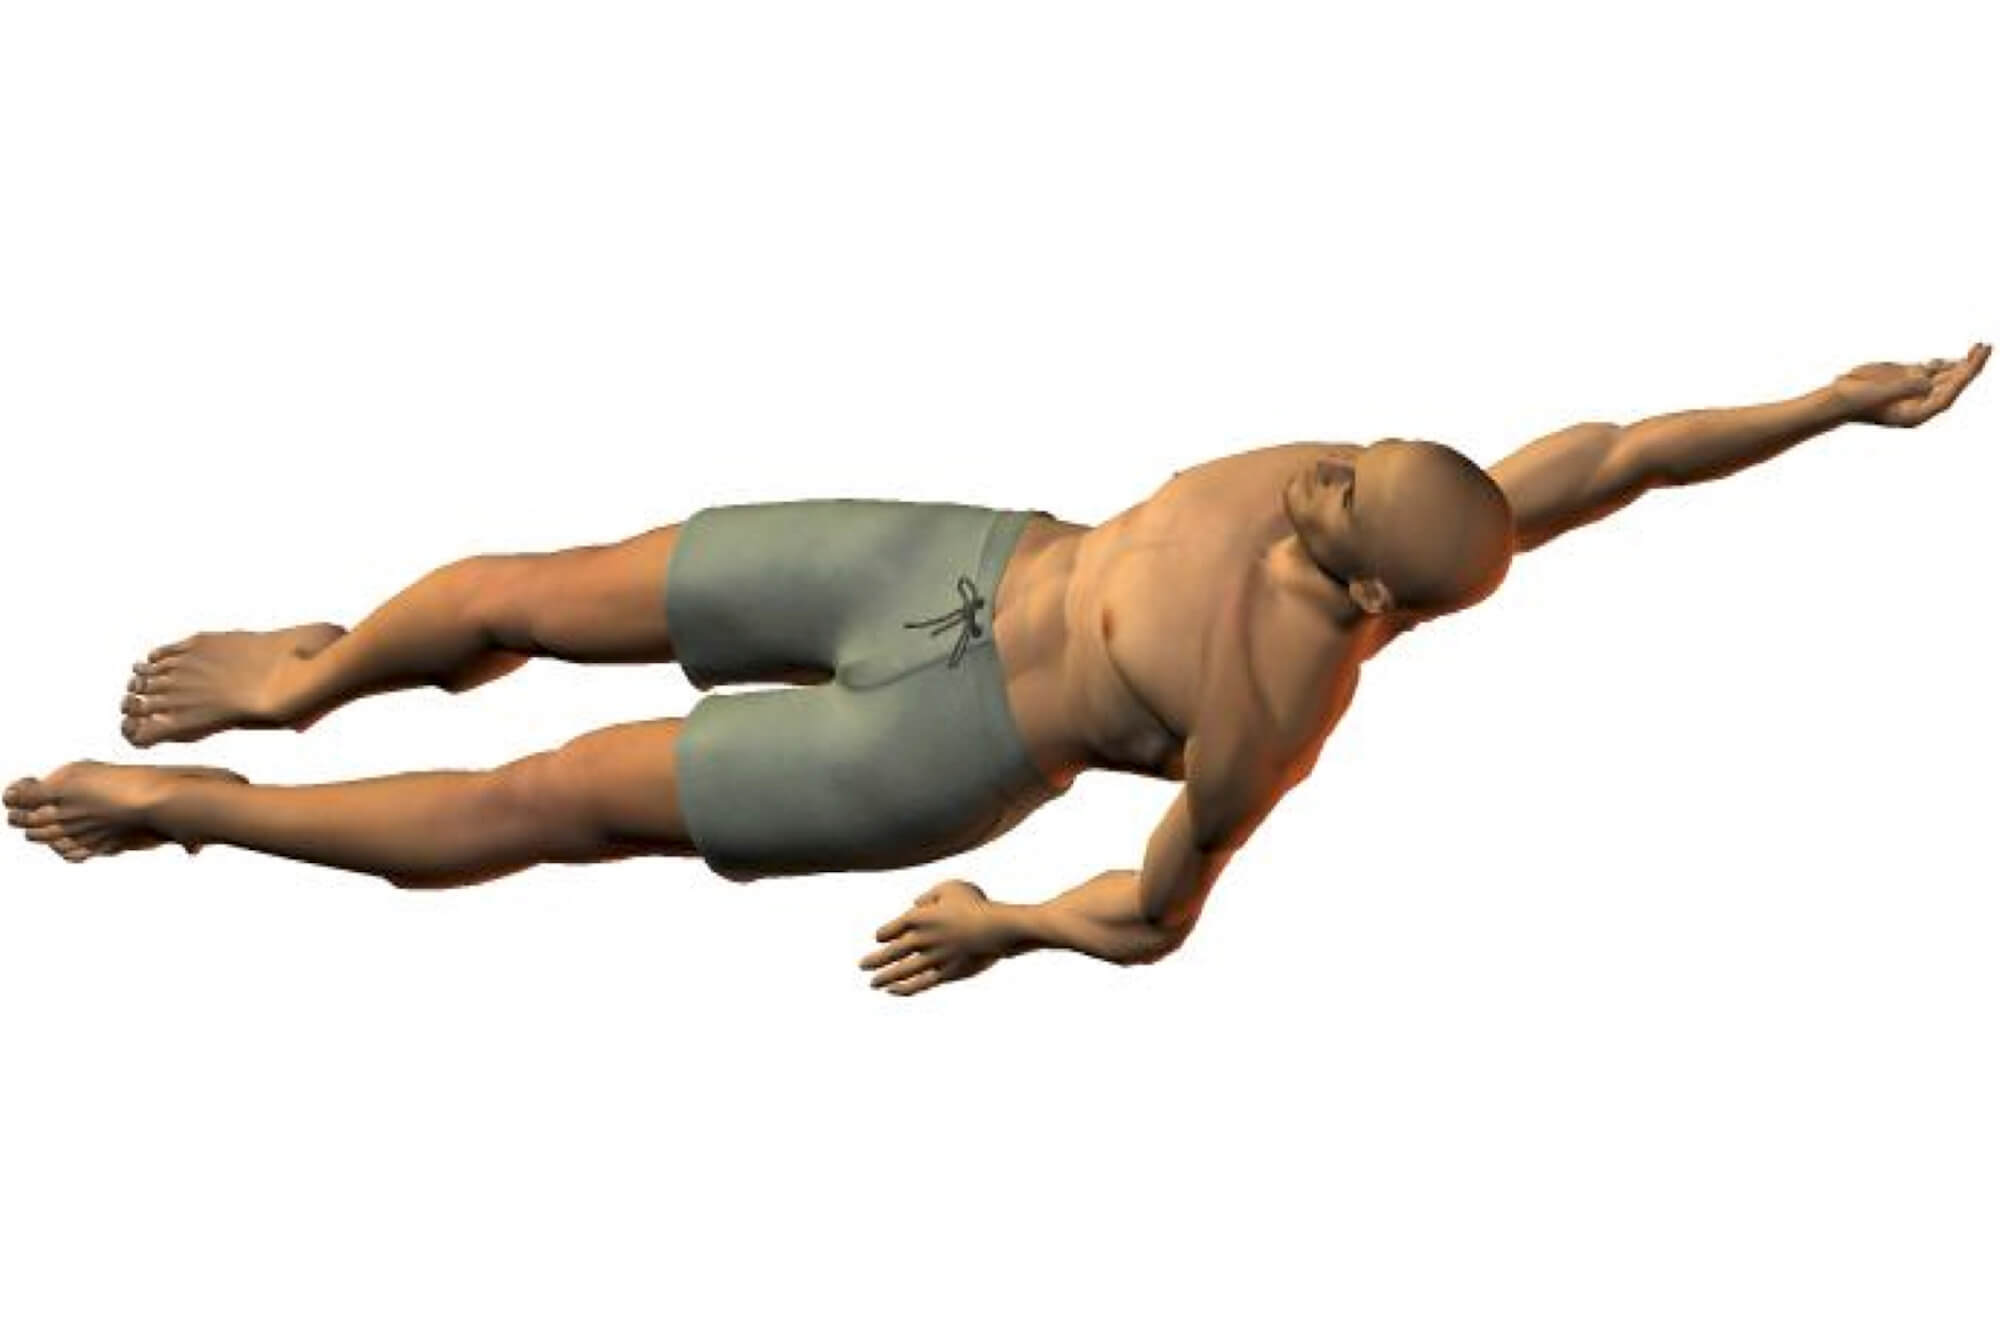 Backstroke breathing is regular and rhythmical